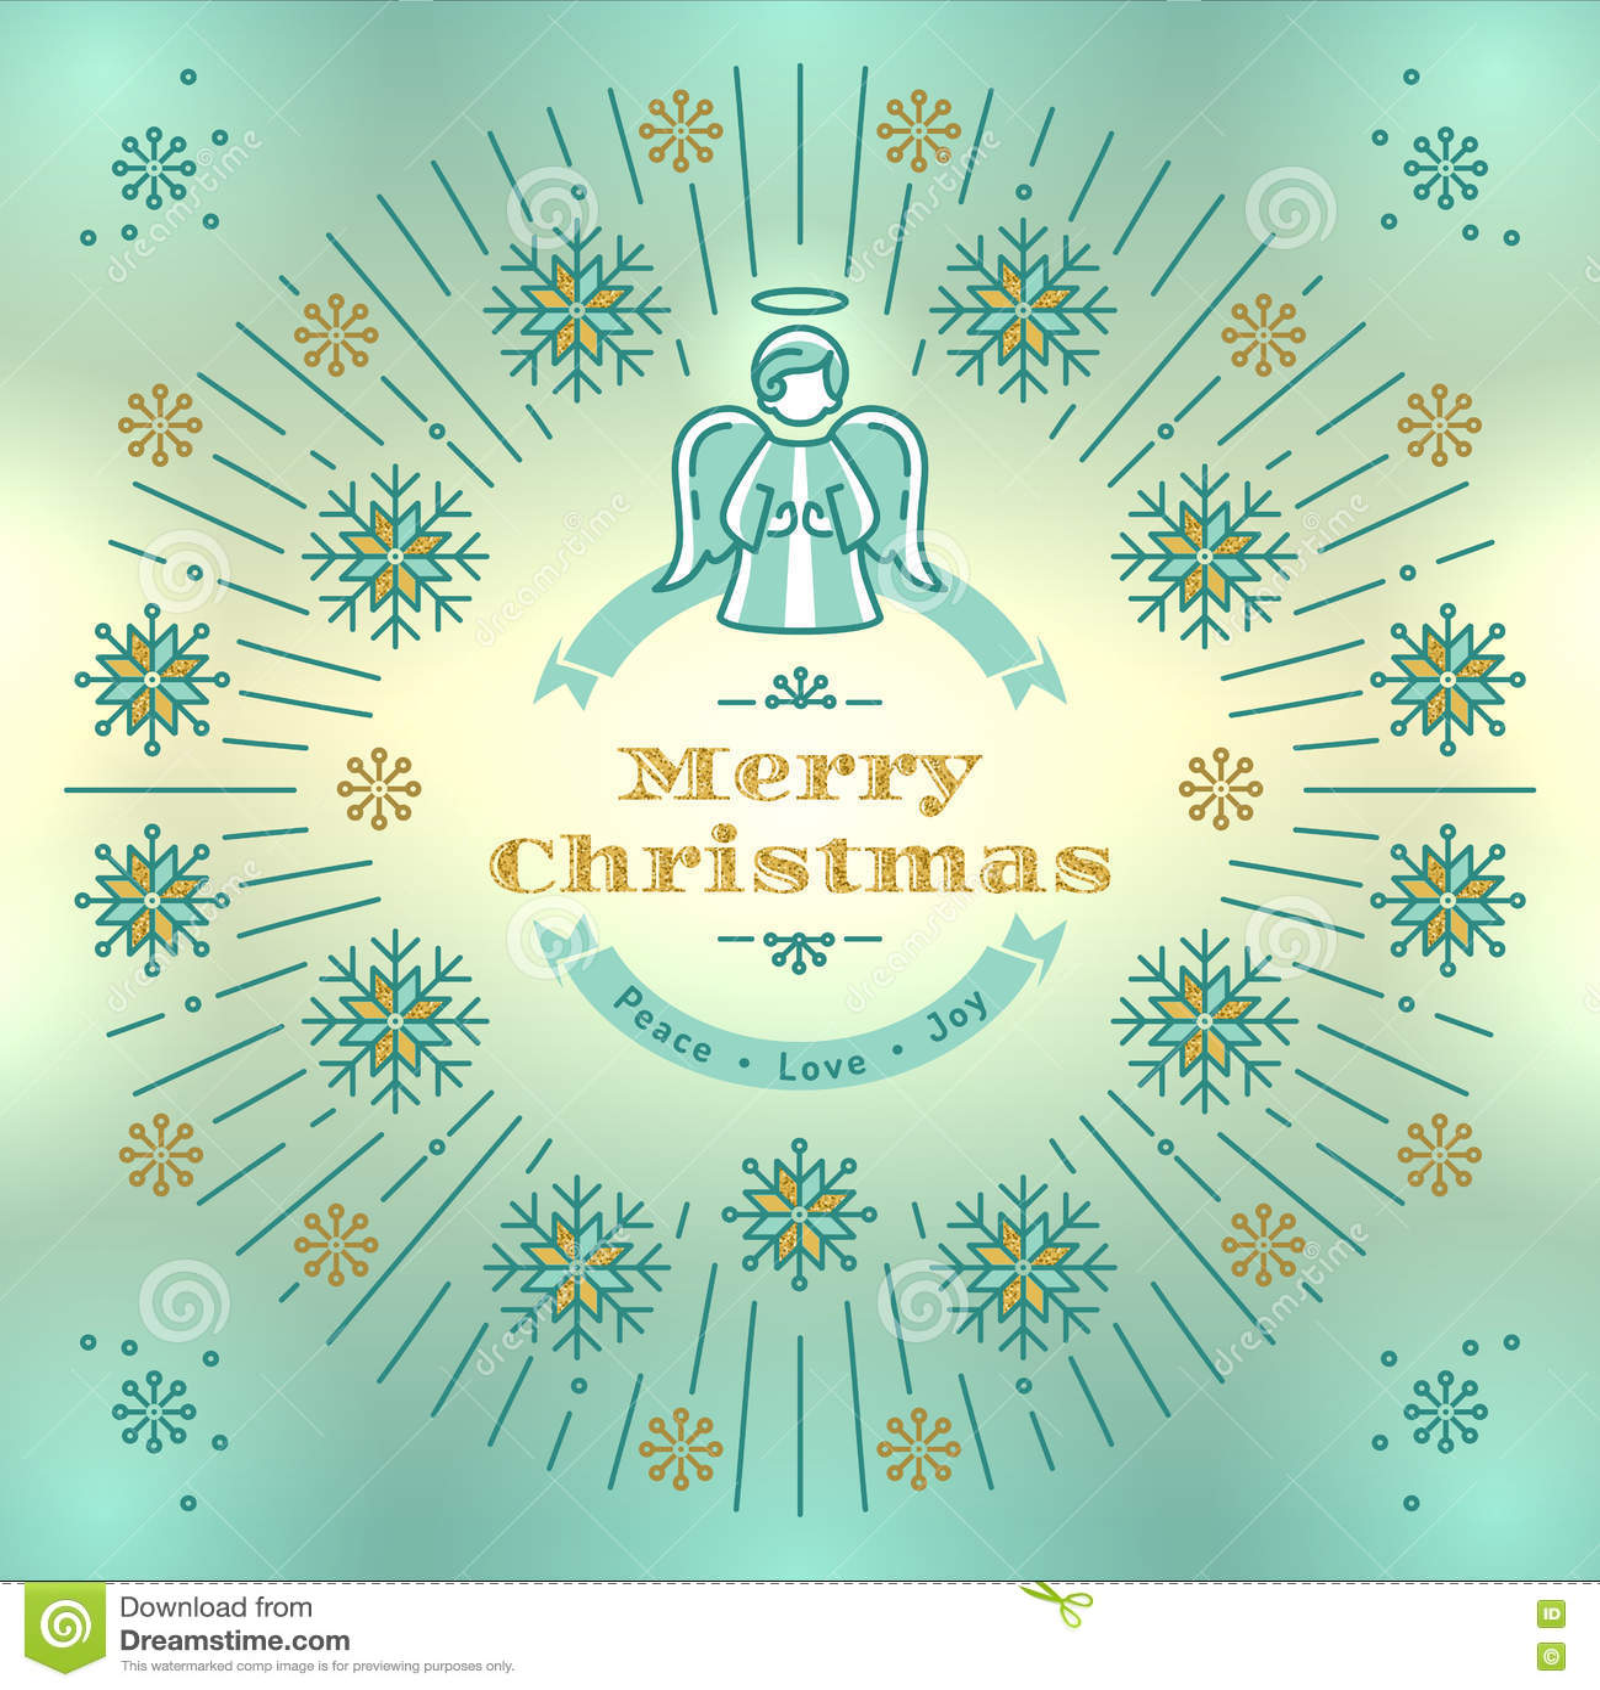 Auguri Di Buon Natale Eleganti.Cartolina D Auguri Di Buon Natale Vettore Di Angelo Fondo Elegante